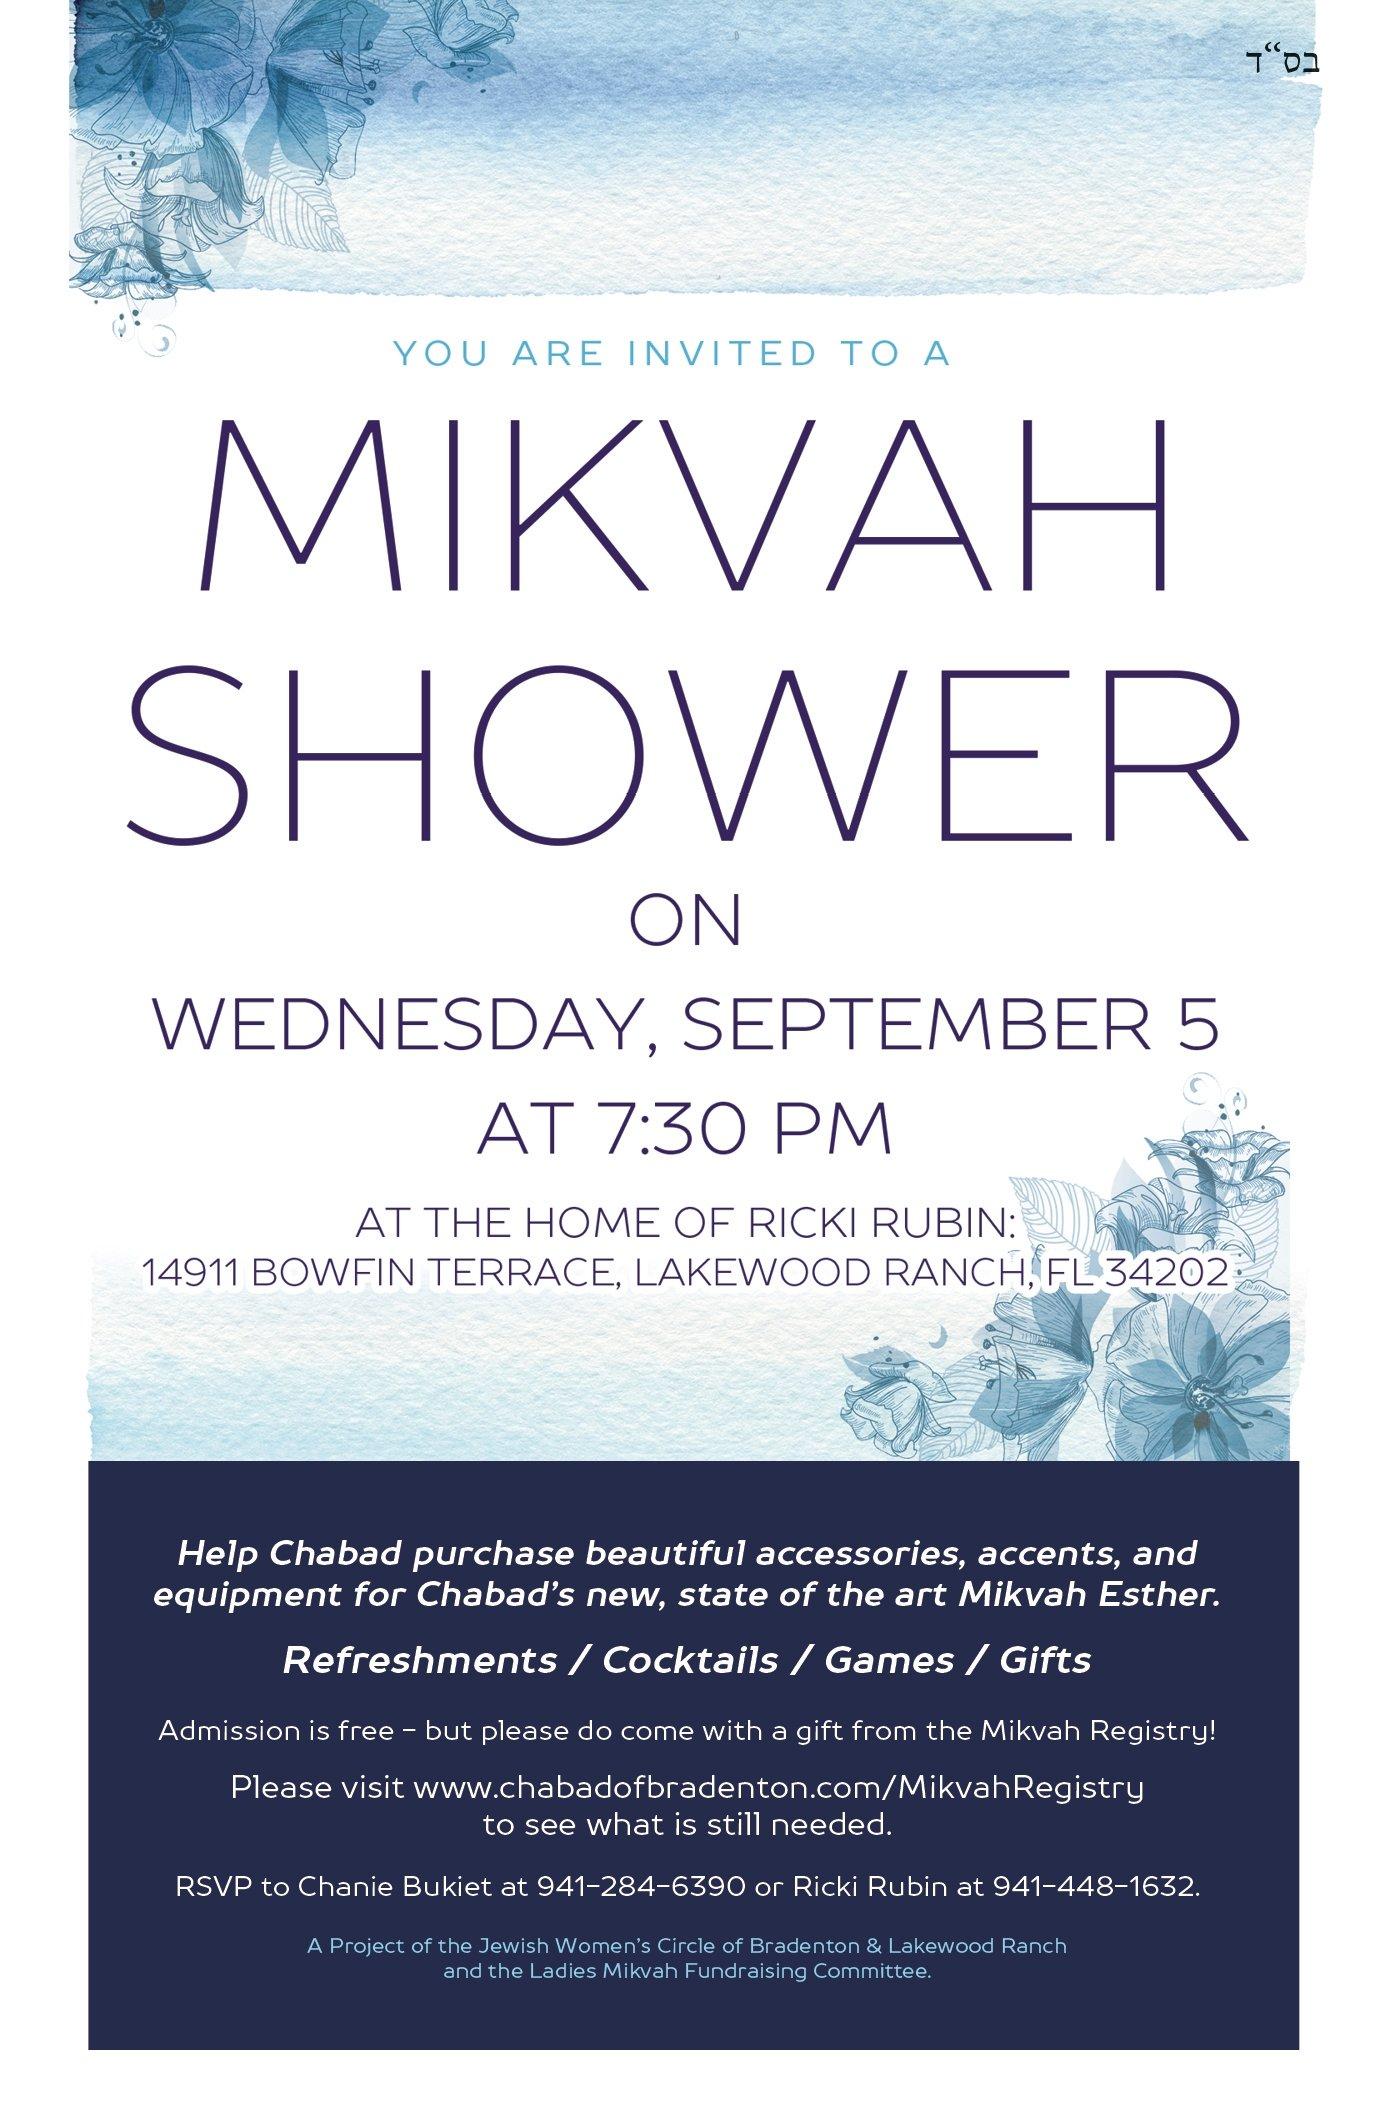 Mikvah invite rv4 (1).jpg